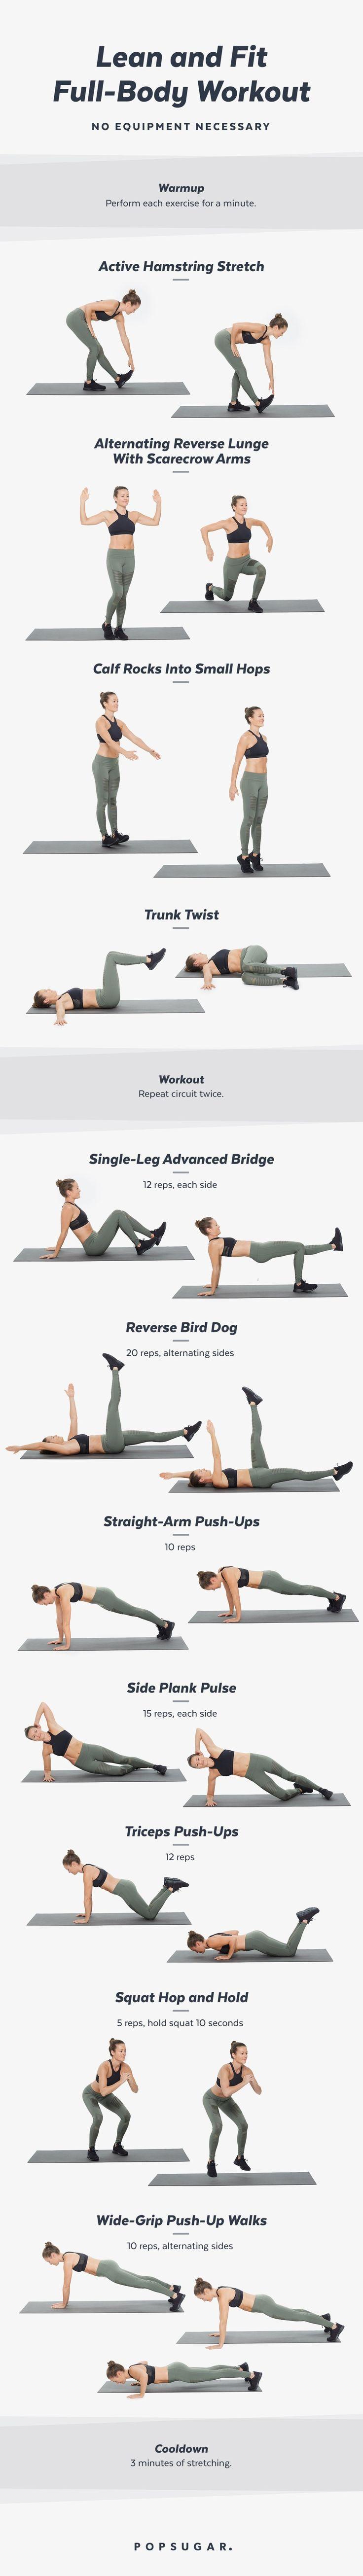 20-Minute Bodyweight Workout | Video | POPSUGAR Fitness